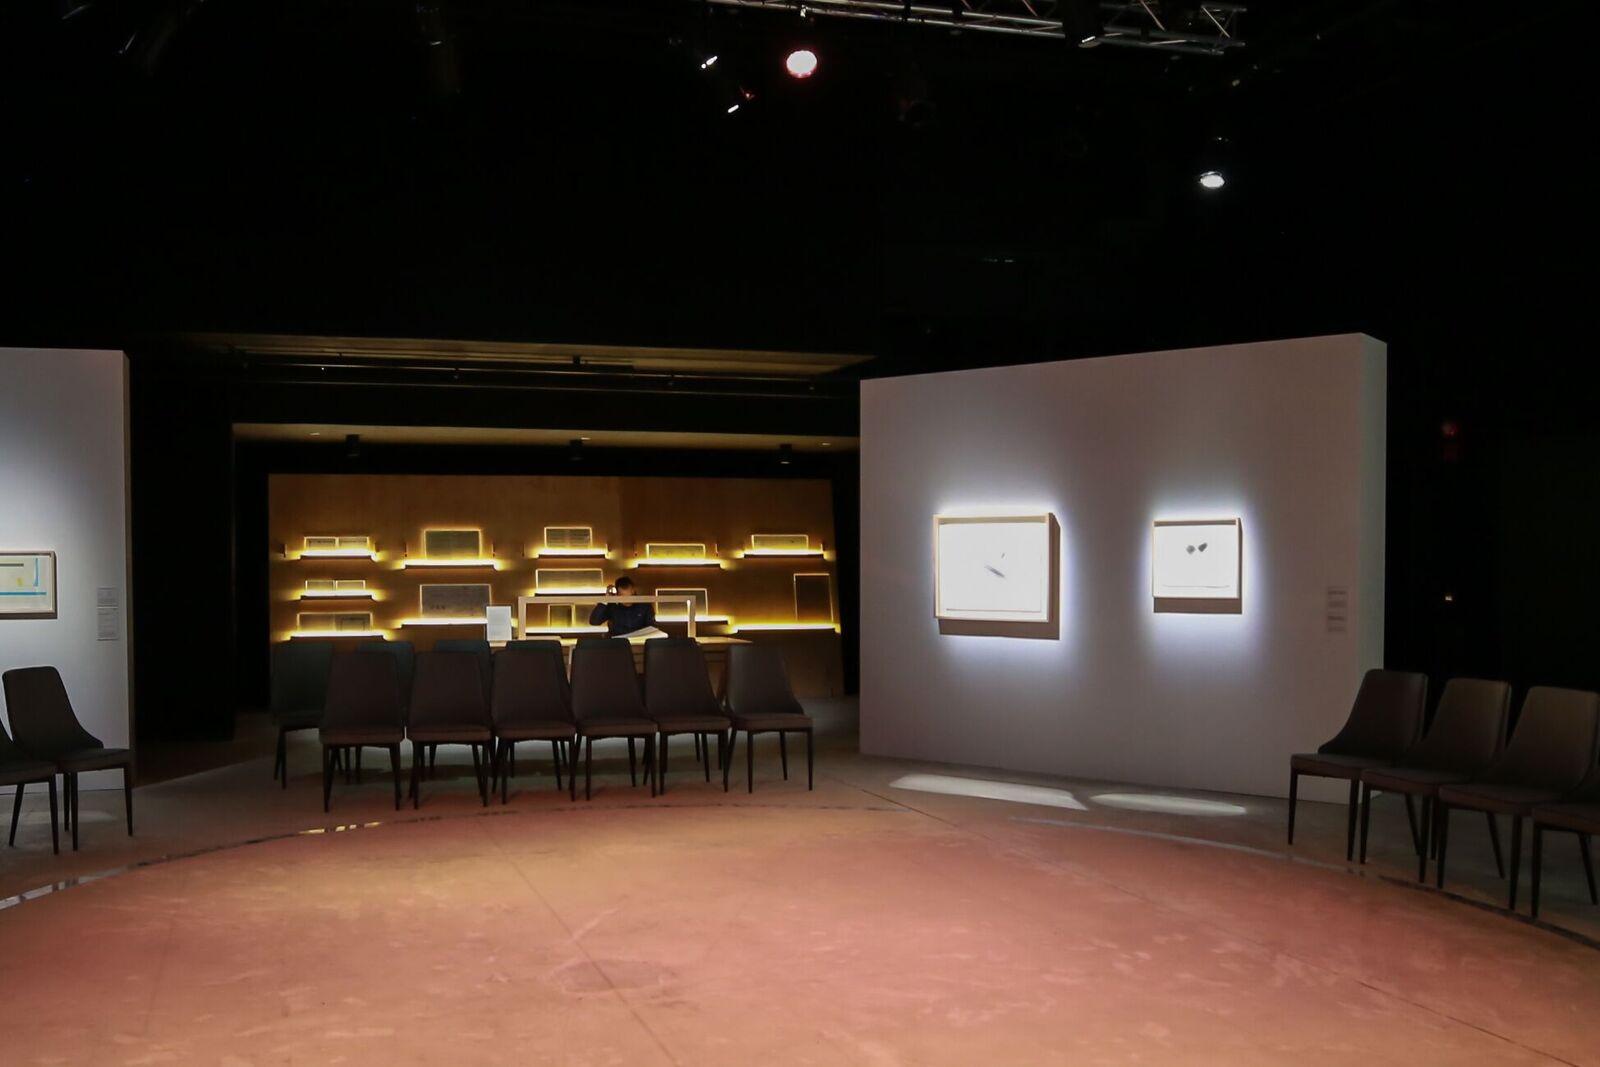 Notating Beauty That Moves Exhibition and Opening Concert, ArtisTree, Hong Kong, March 3, 2018. Courtesy Hong Kong Sinfonietta Limited 《谱写动态的美》展览现场图,ArtisTree, 香港,2018.3.3. 致谢香港小交响乐团